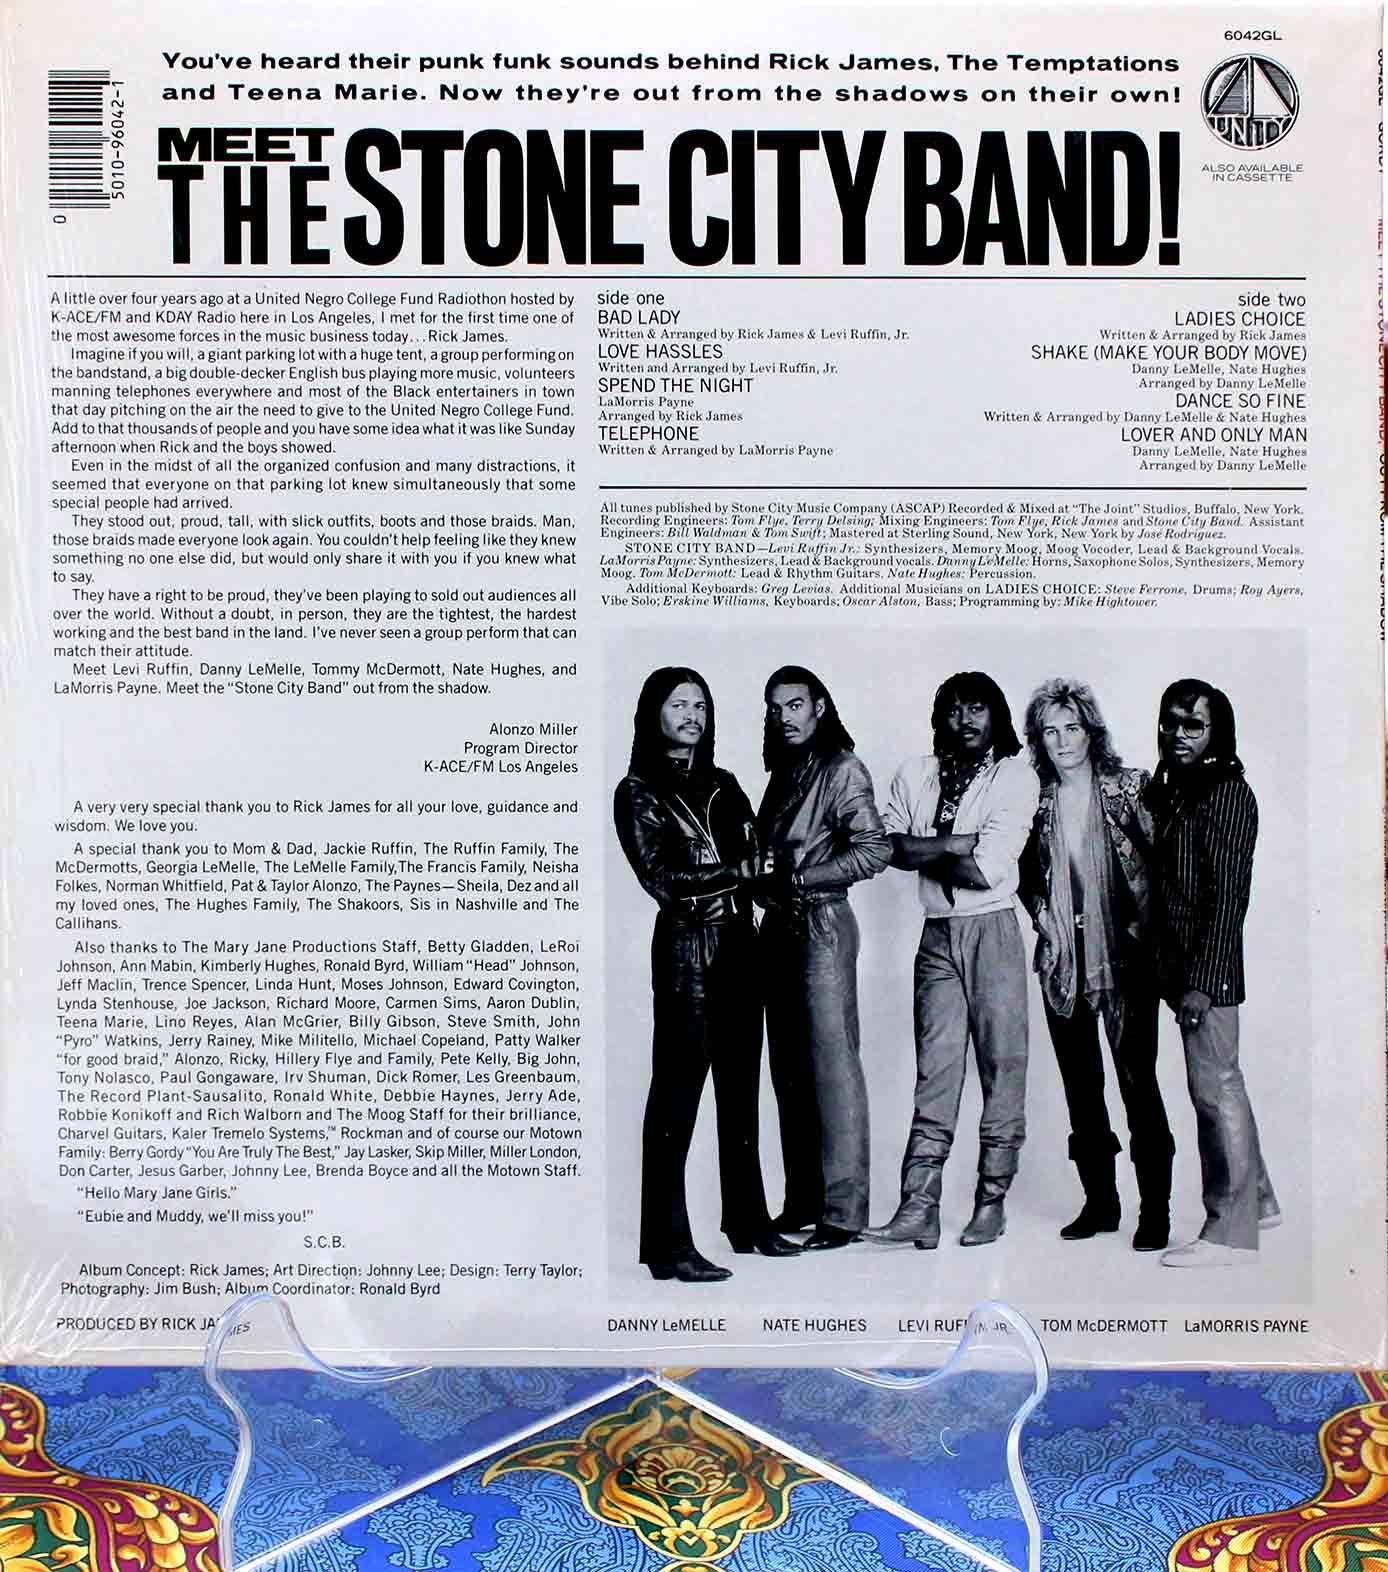 Stone City Band – Meet The Stone City Band 02